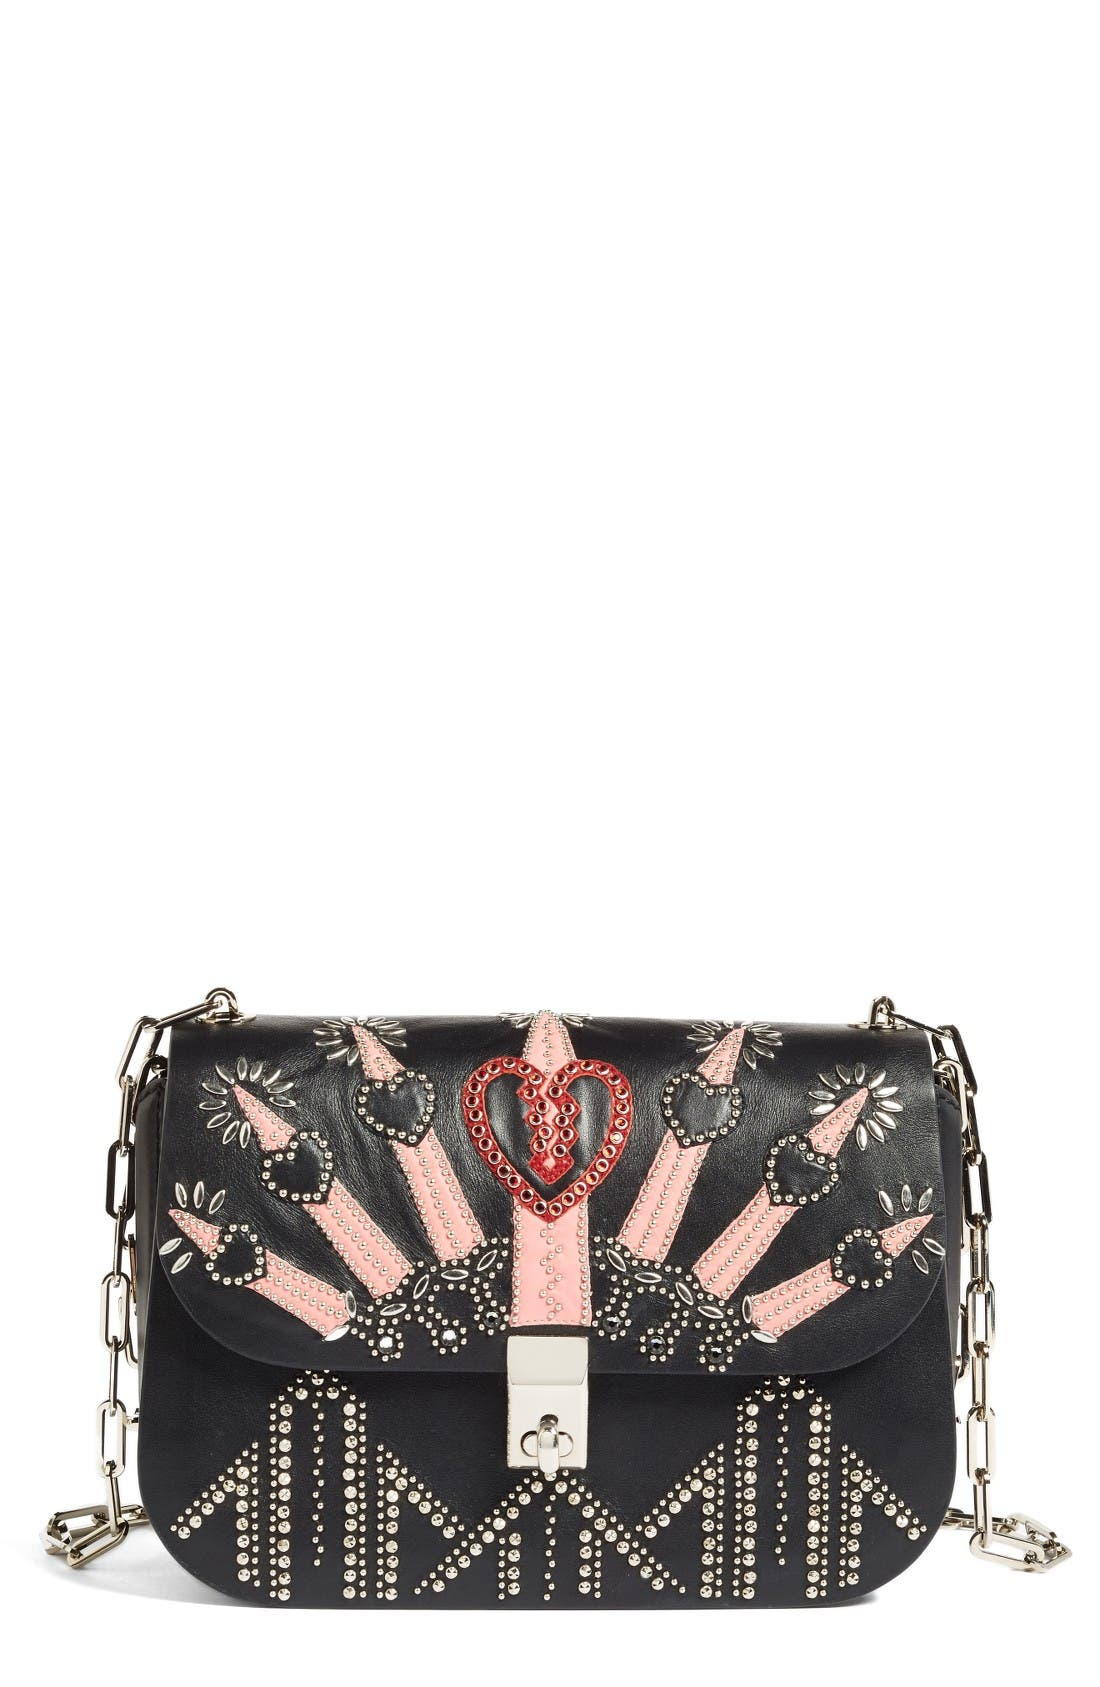 Main Image - Valentino Love Blade Embroidered Calfskin Leather Shoulder Bag